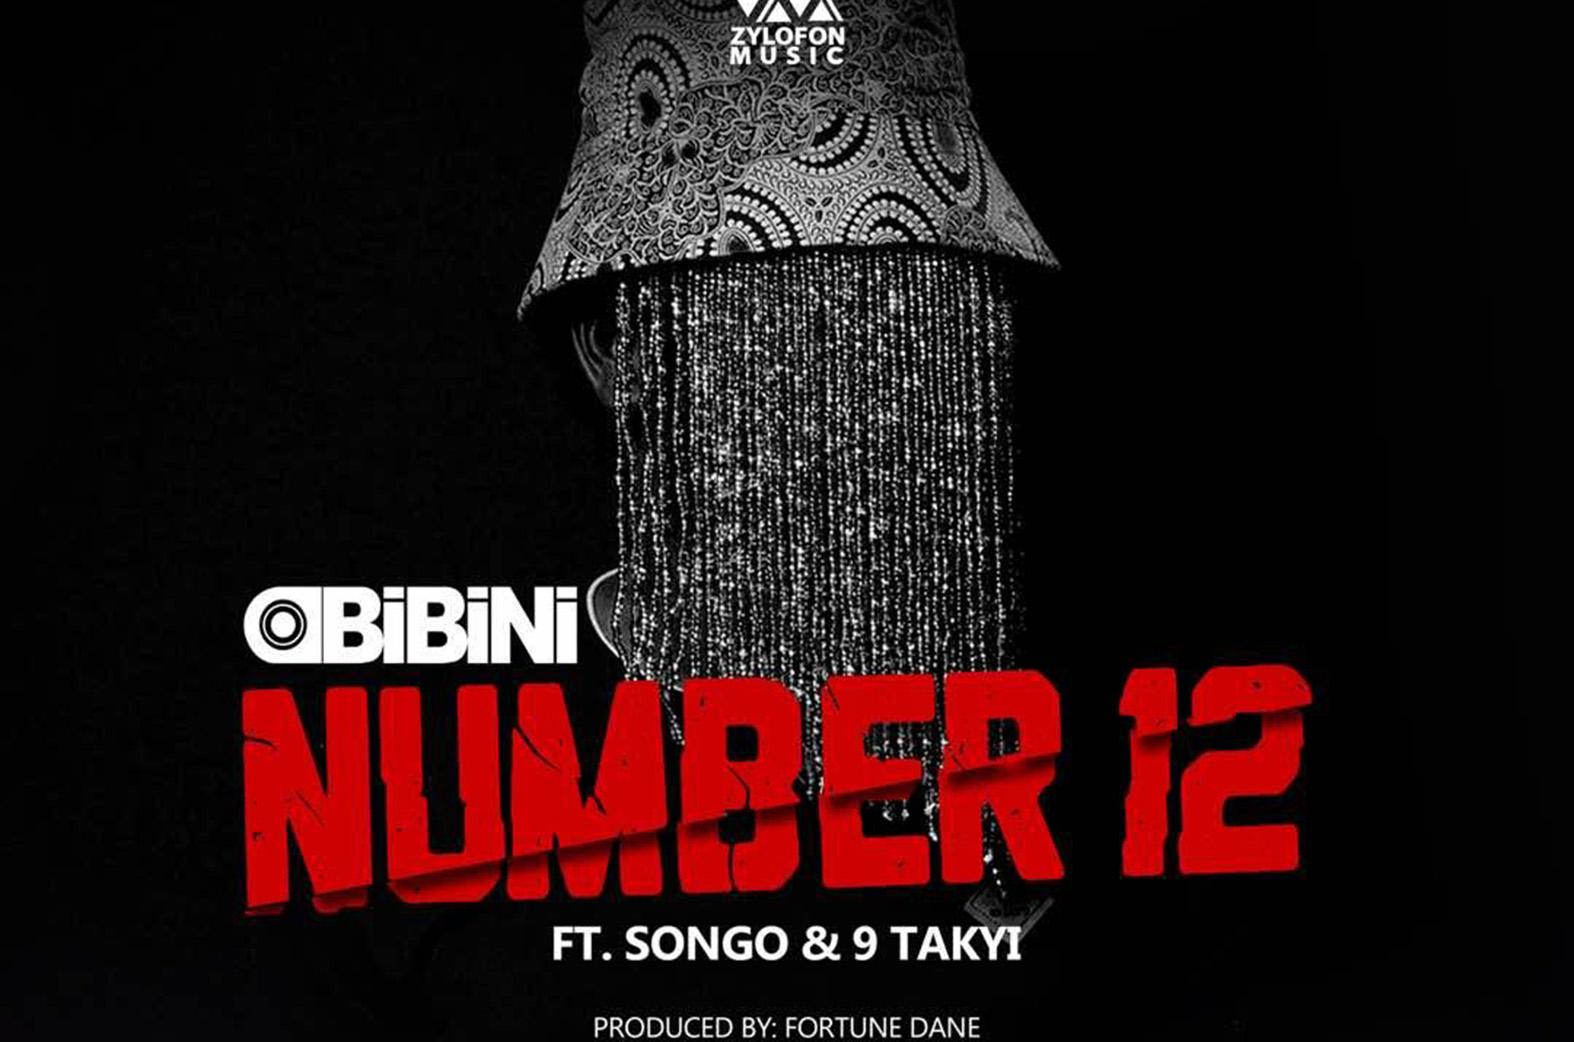 Obibini endorses Anas' exposé with new single